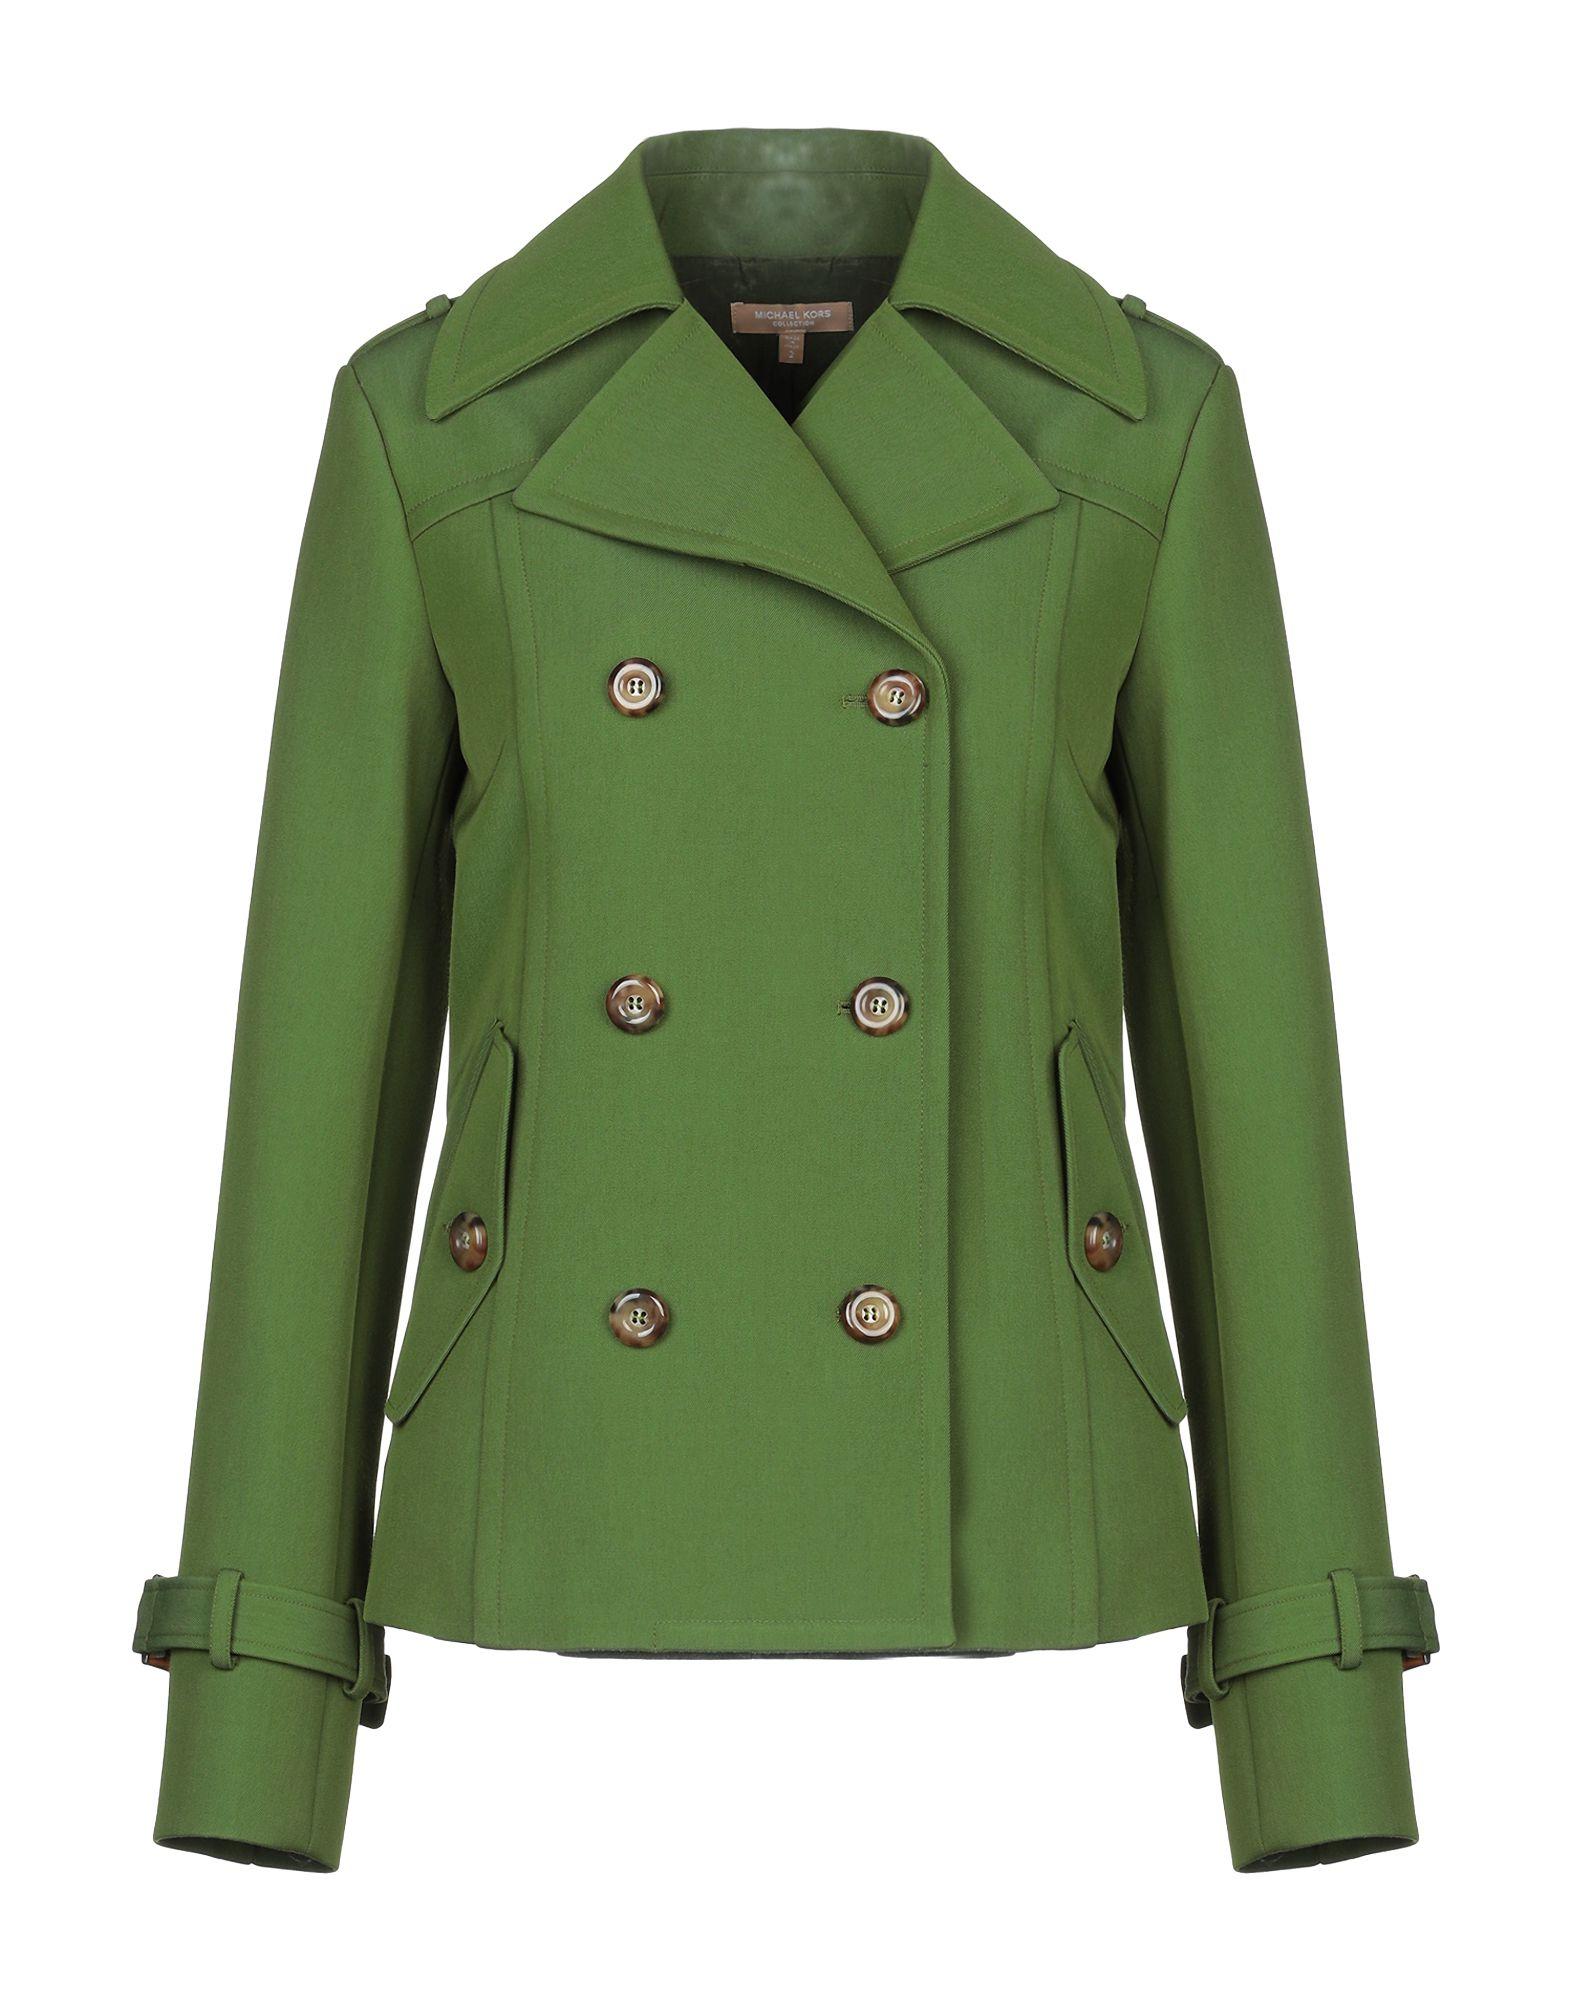 MICHAEL KORS COLLECTION Пиджак lady chic® collection пиджак